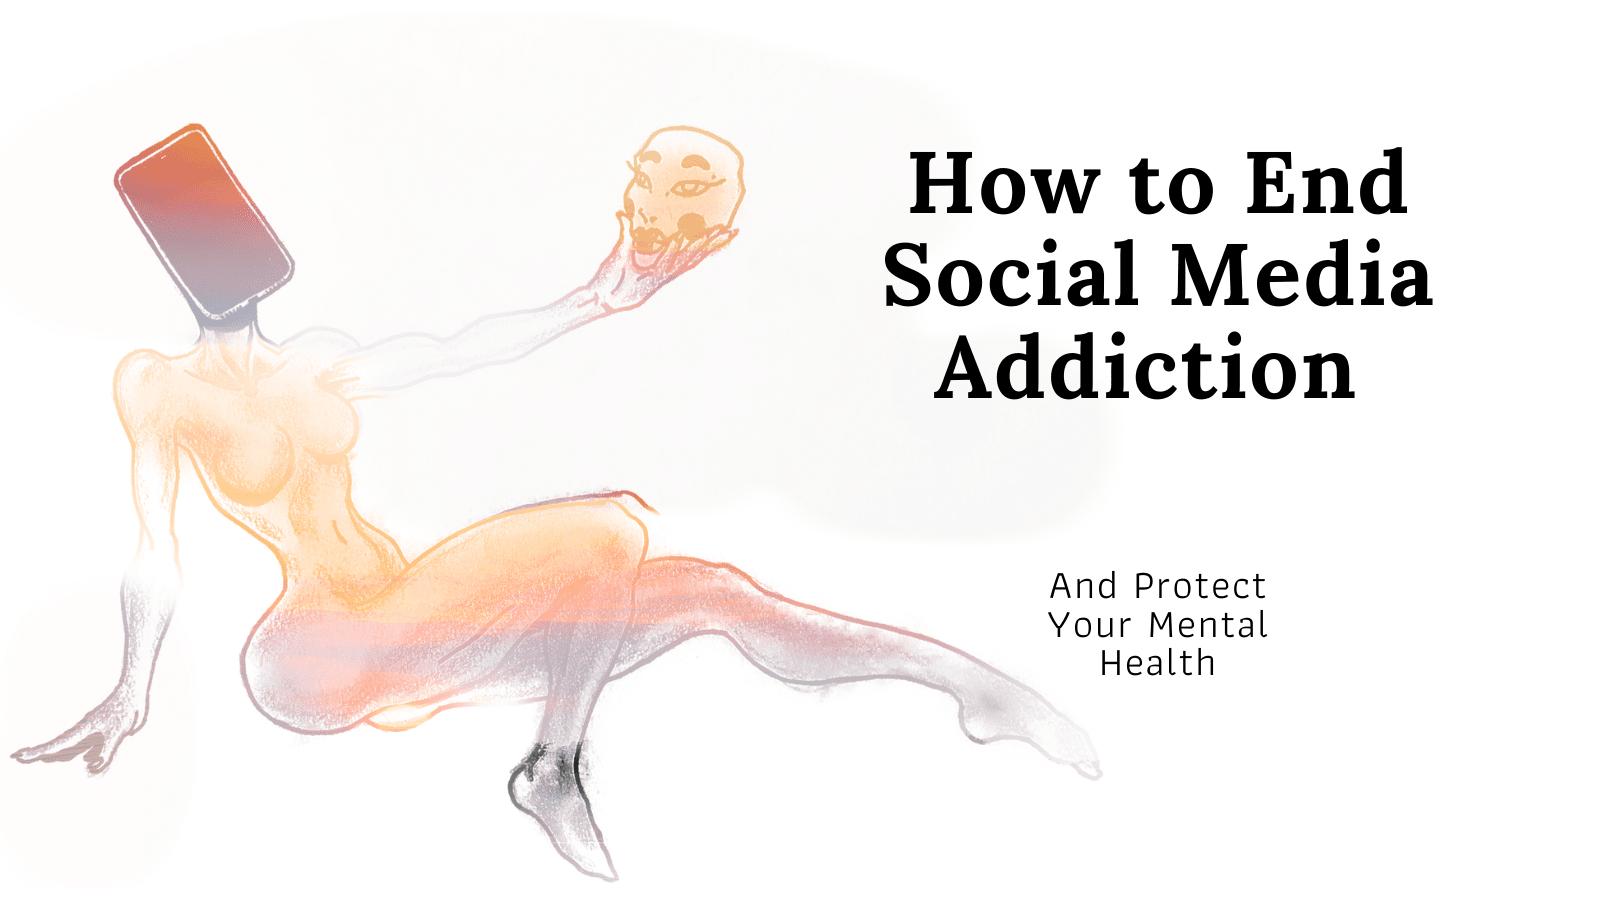 How to End Social Media Addiction